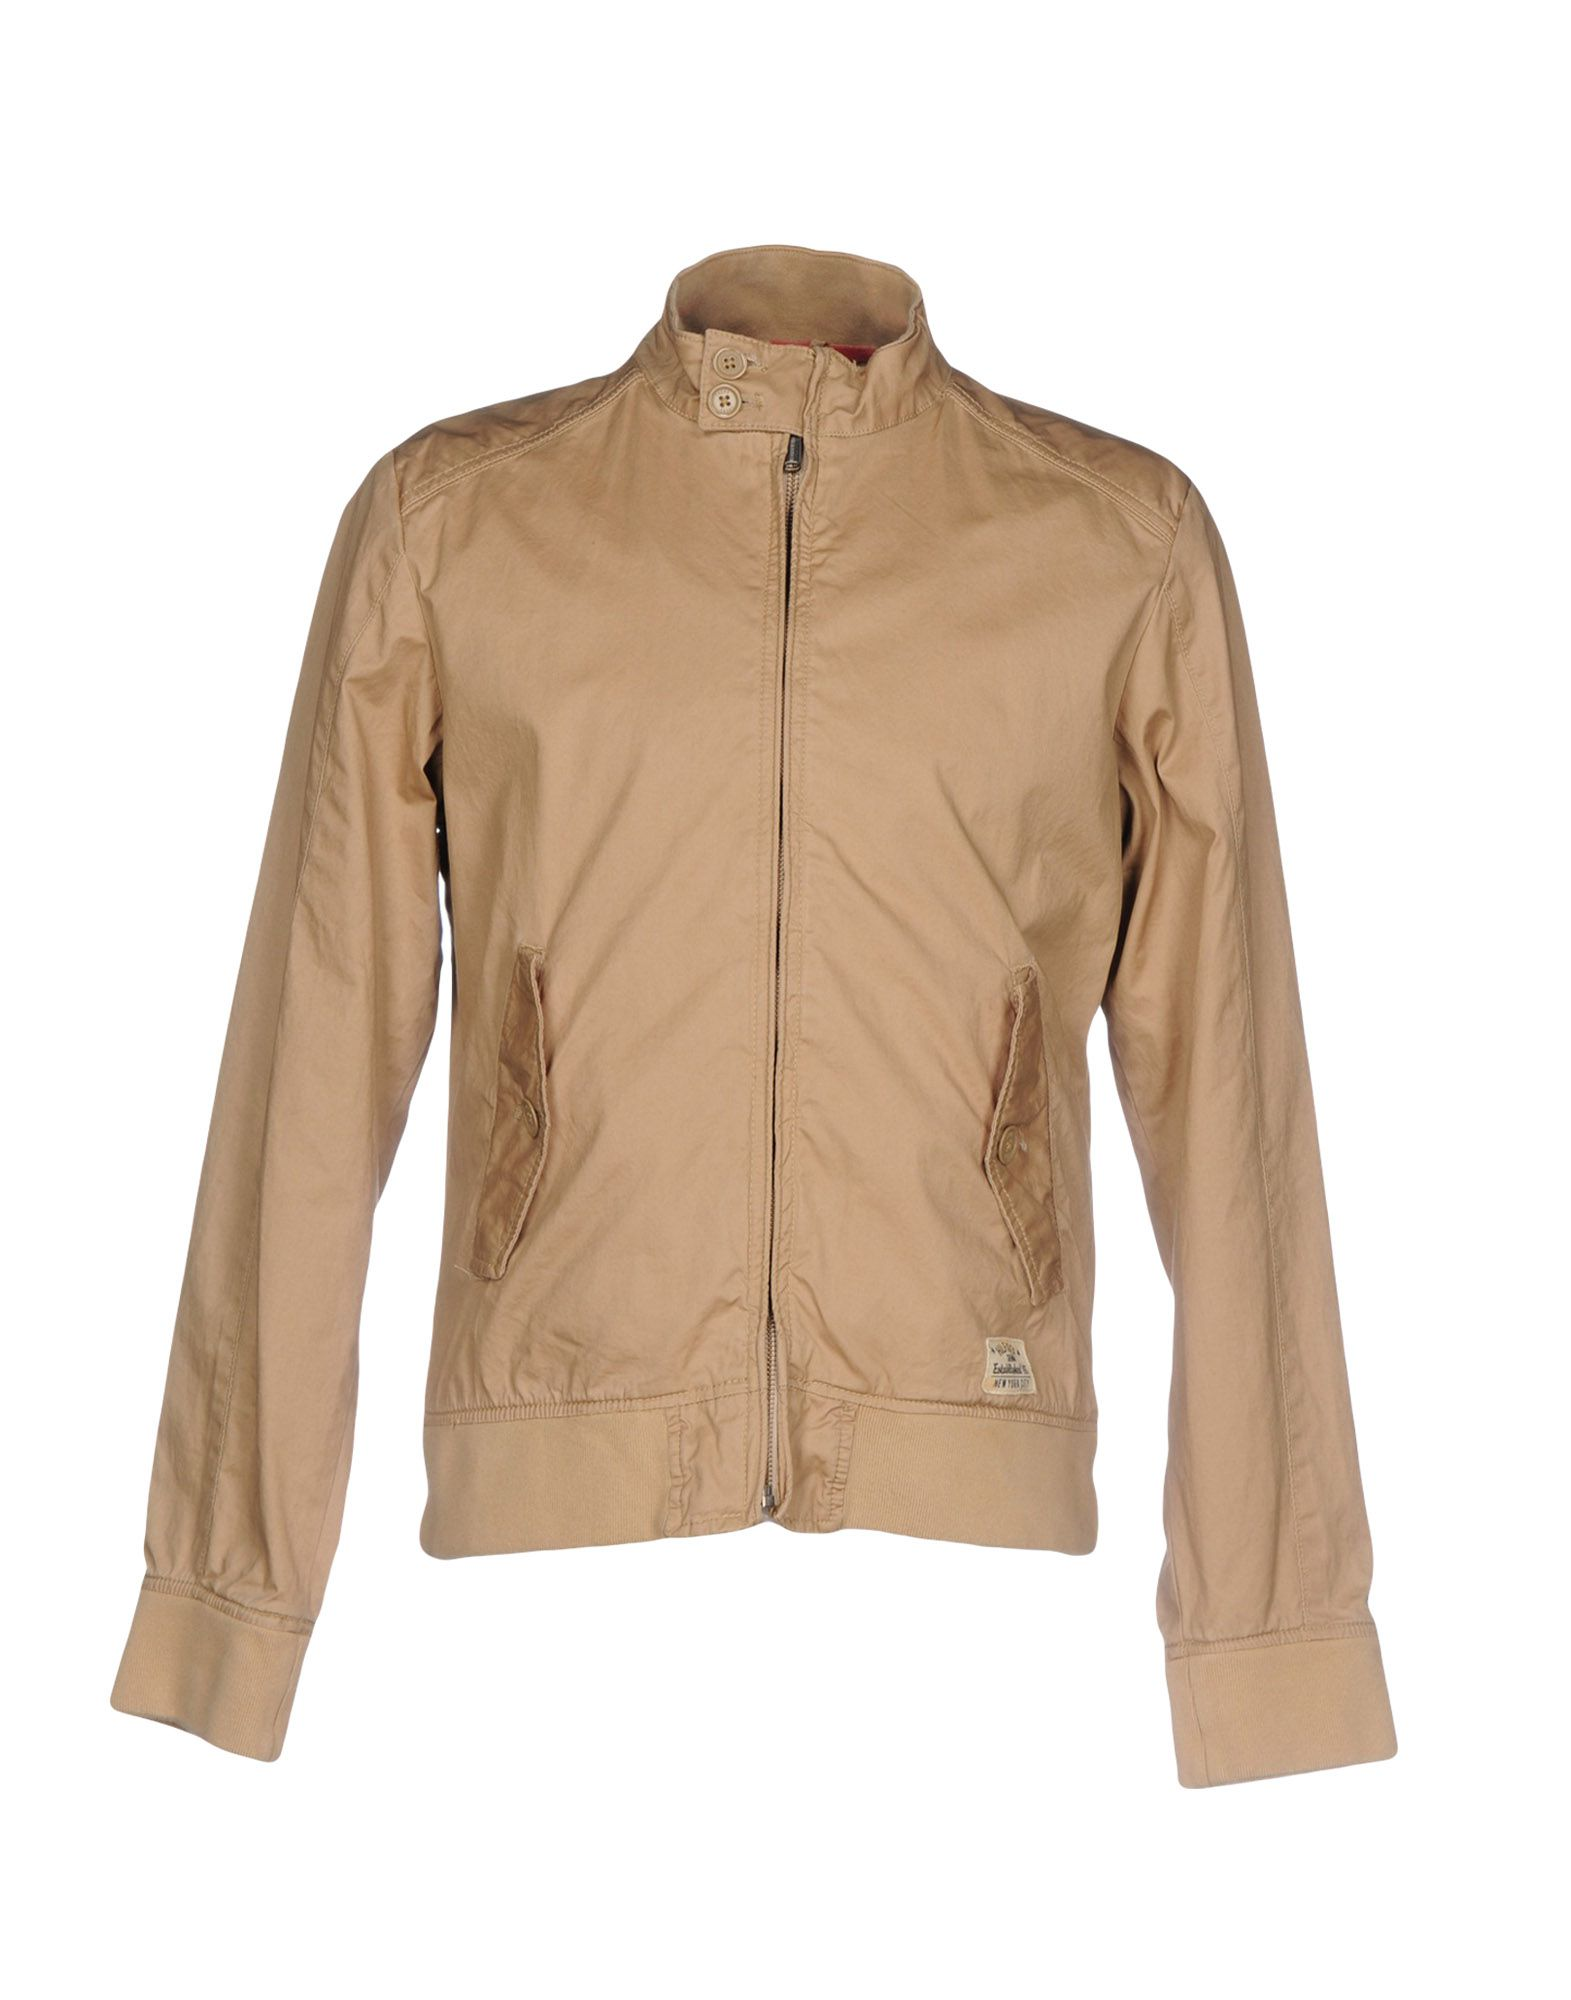 TOMMY HILFIGER DENIM Куртка denim куртка denim 353244400126696